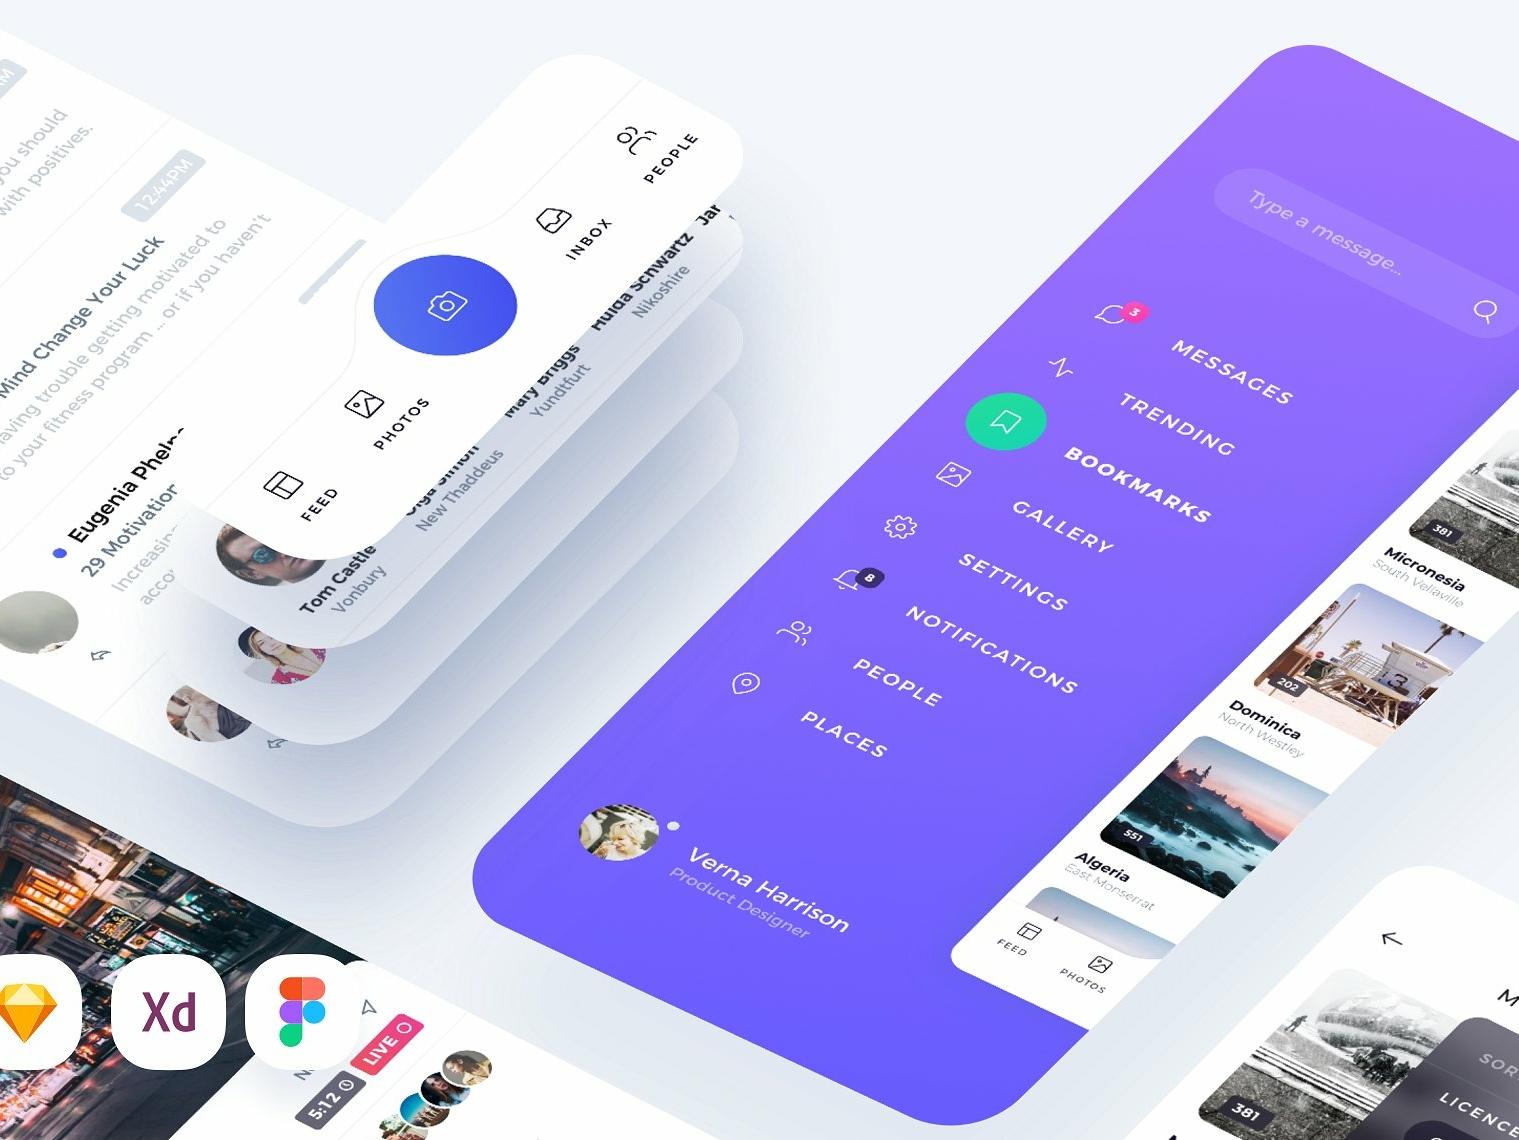 Atro Mobile UI Kit by UIUXE on Dribbble